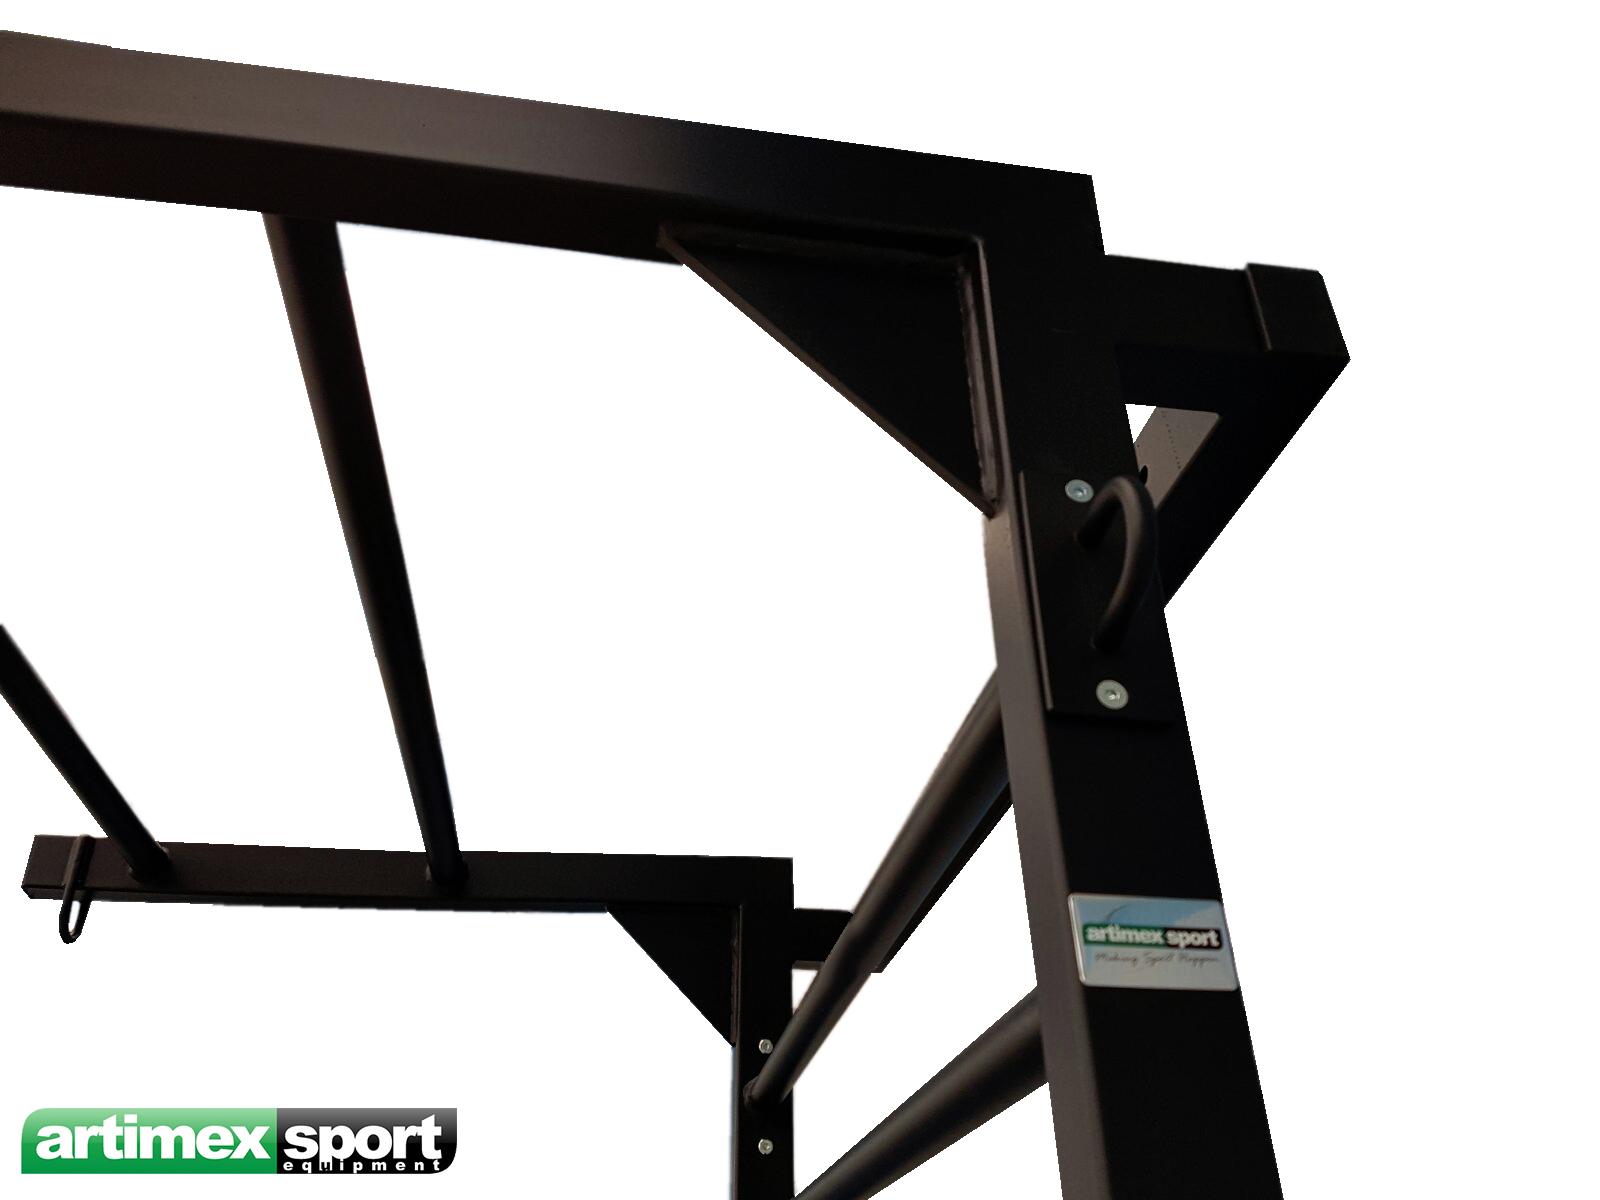 Espalderas-Artimex Sport, Espaldera gimnasio - Ofertas, Fabricante ...